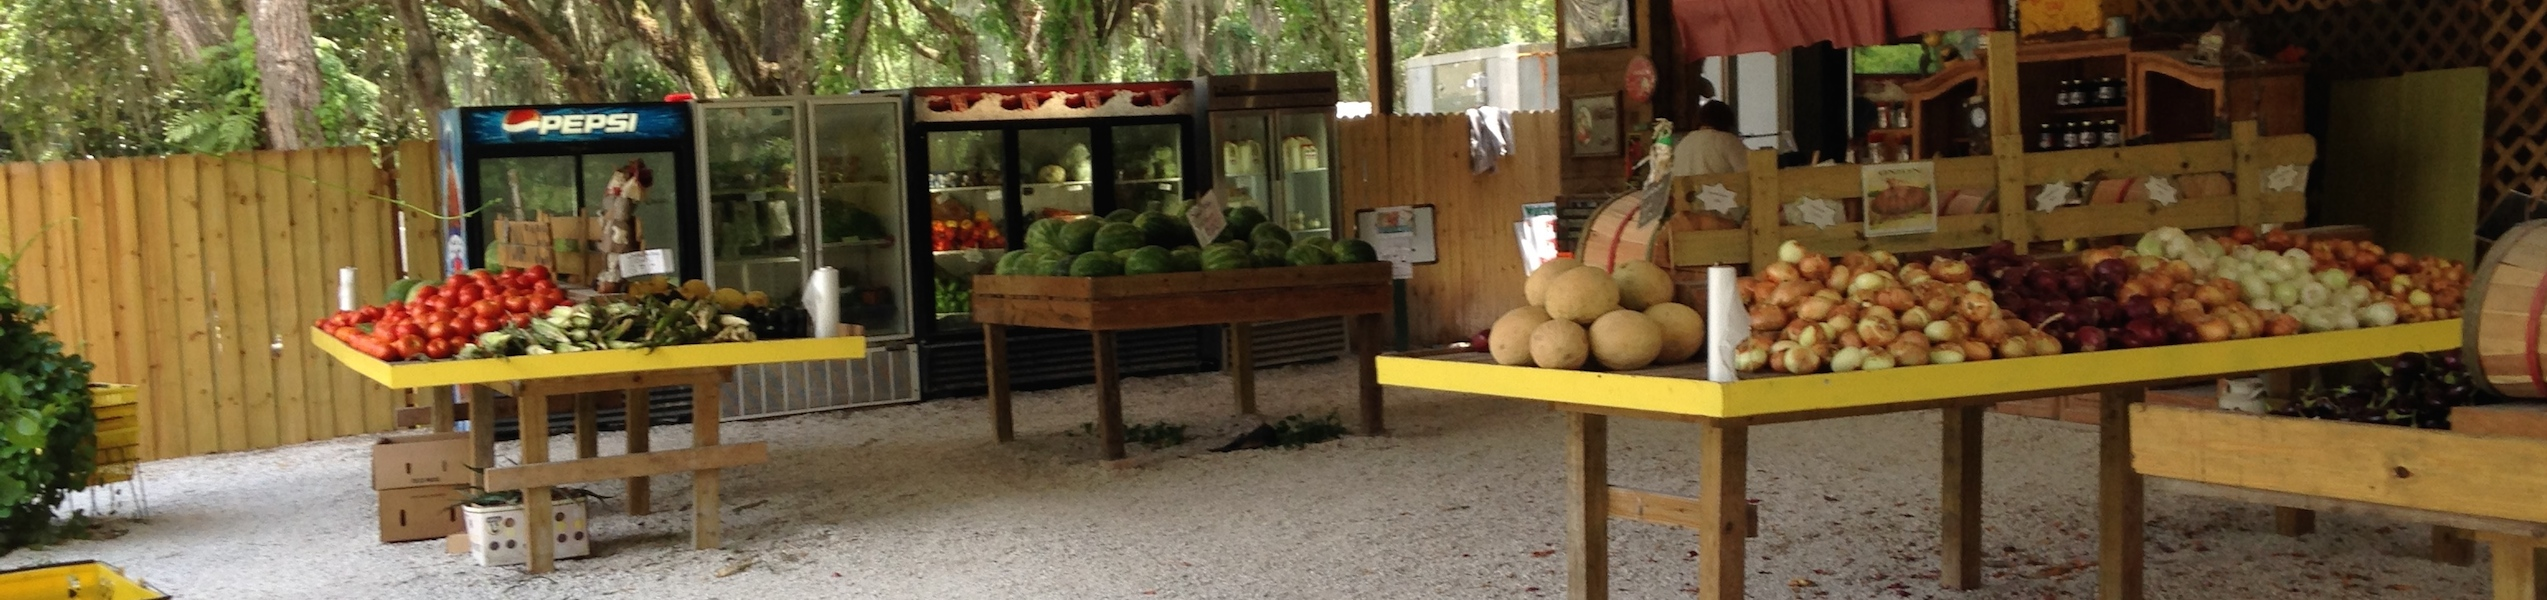 Branchton Farms Farmers Market